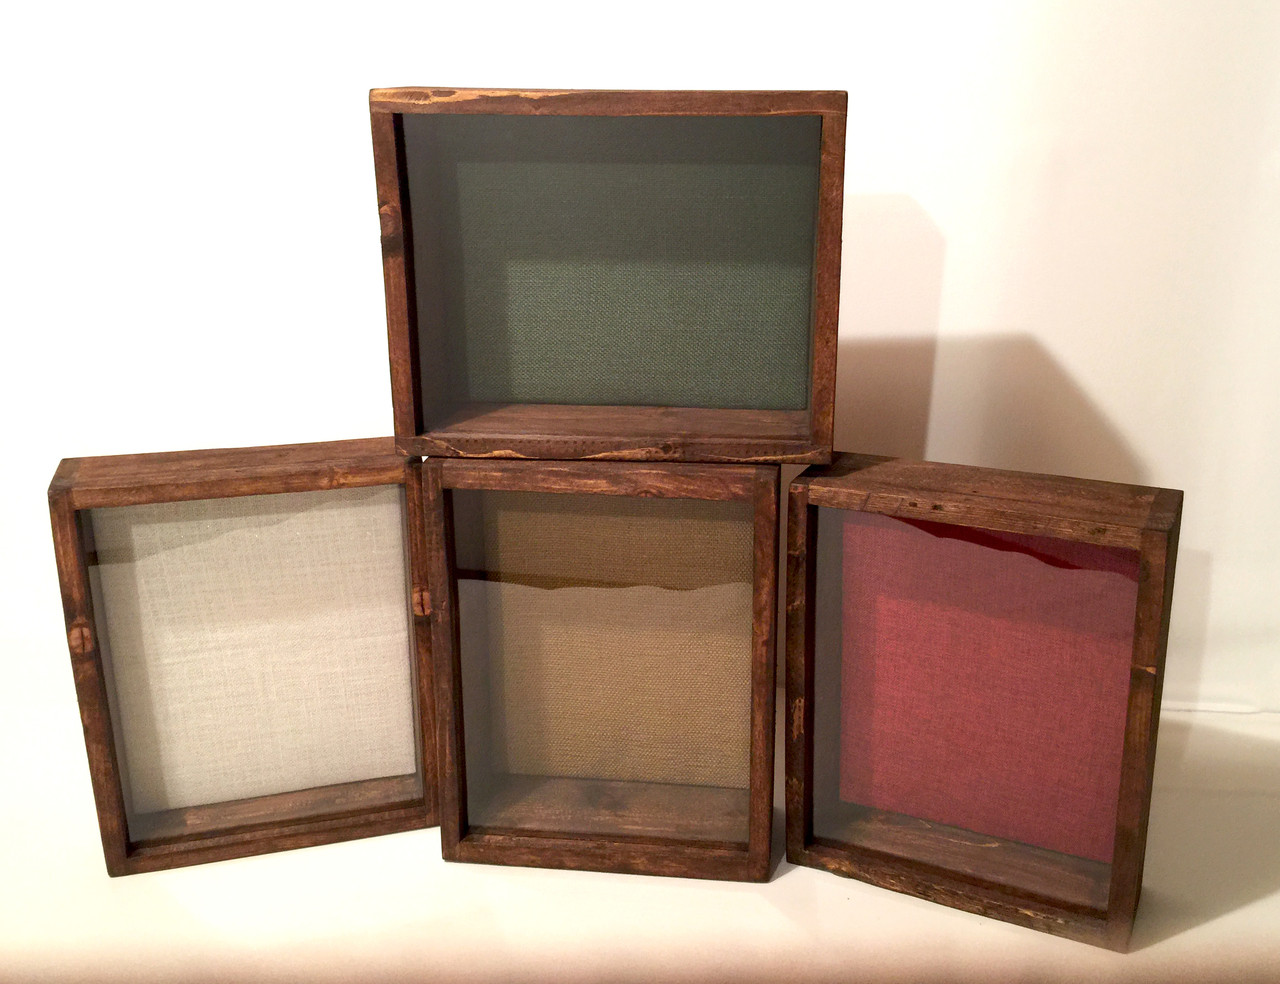 11 x 14 x 3 inch Rustic Shadow Box Frame | The Farm Mechanic